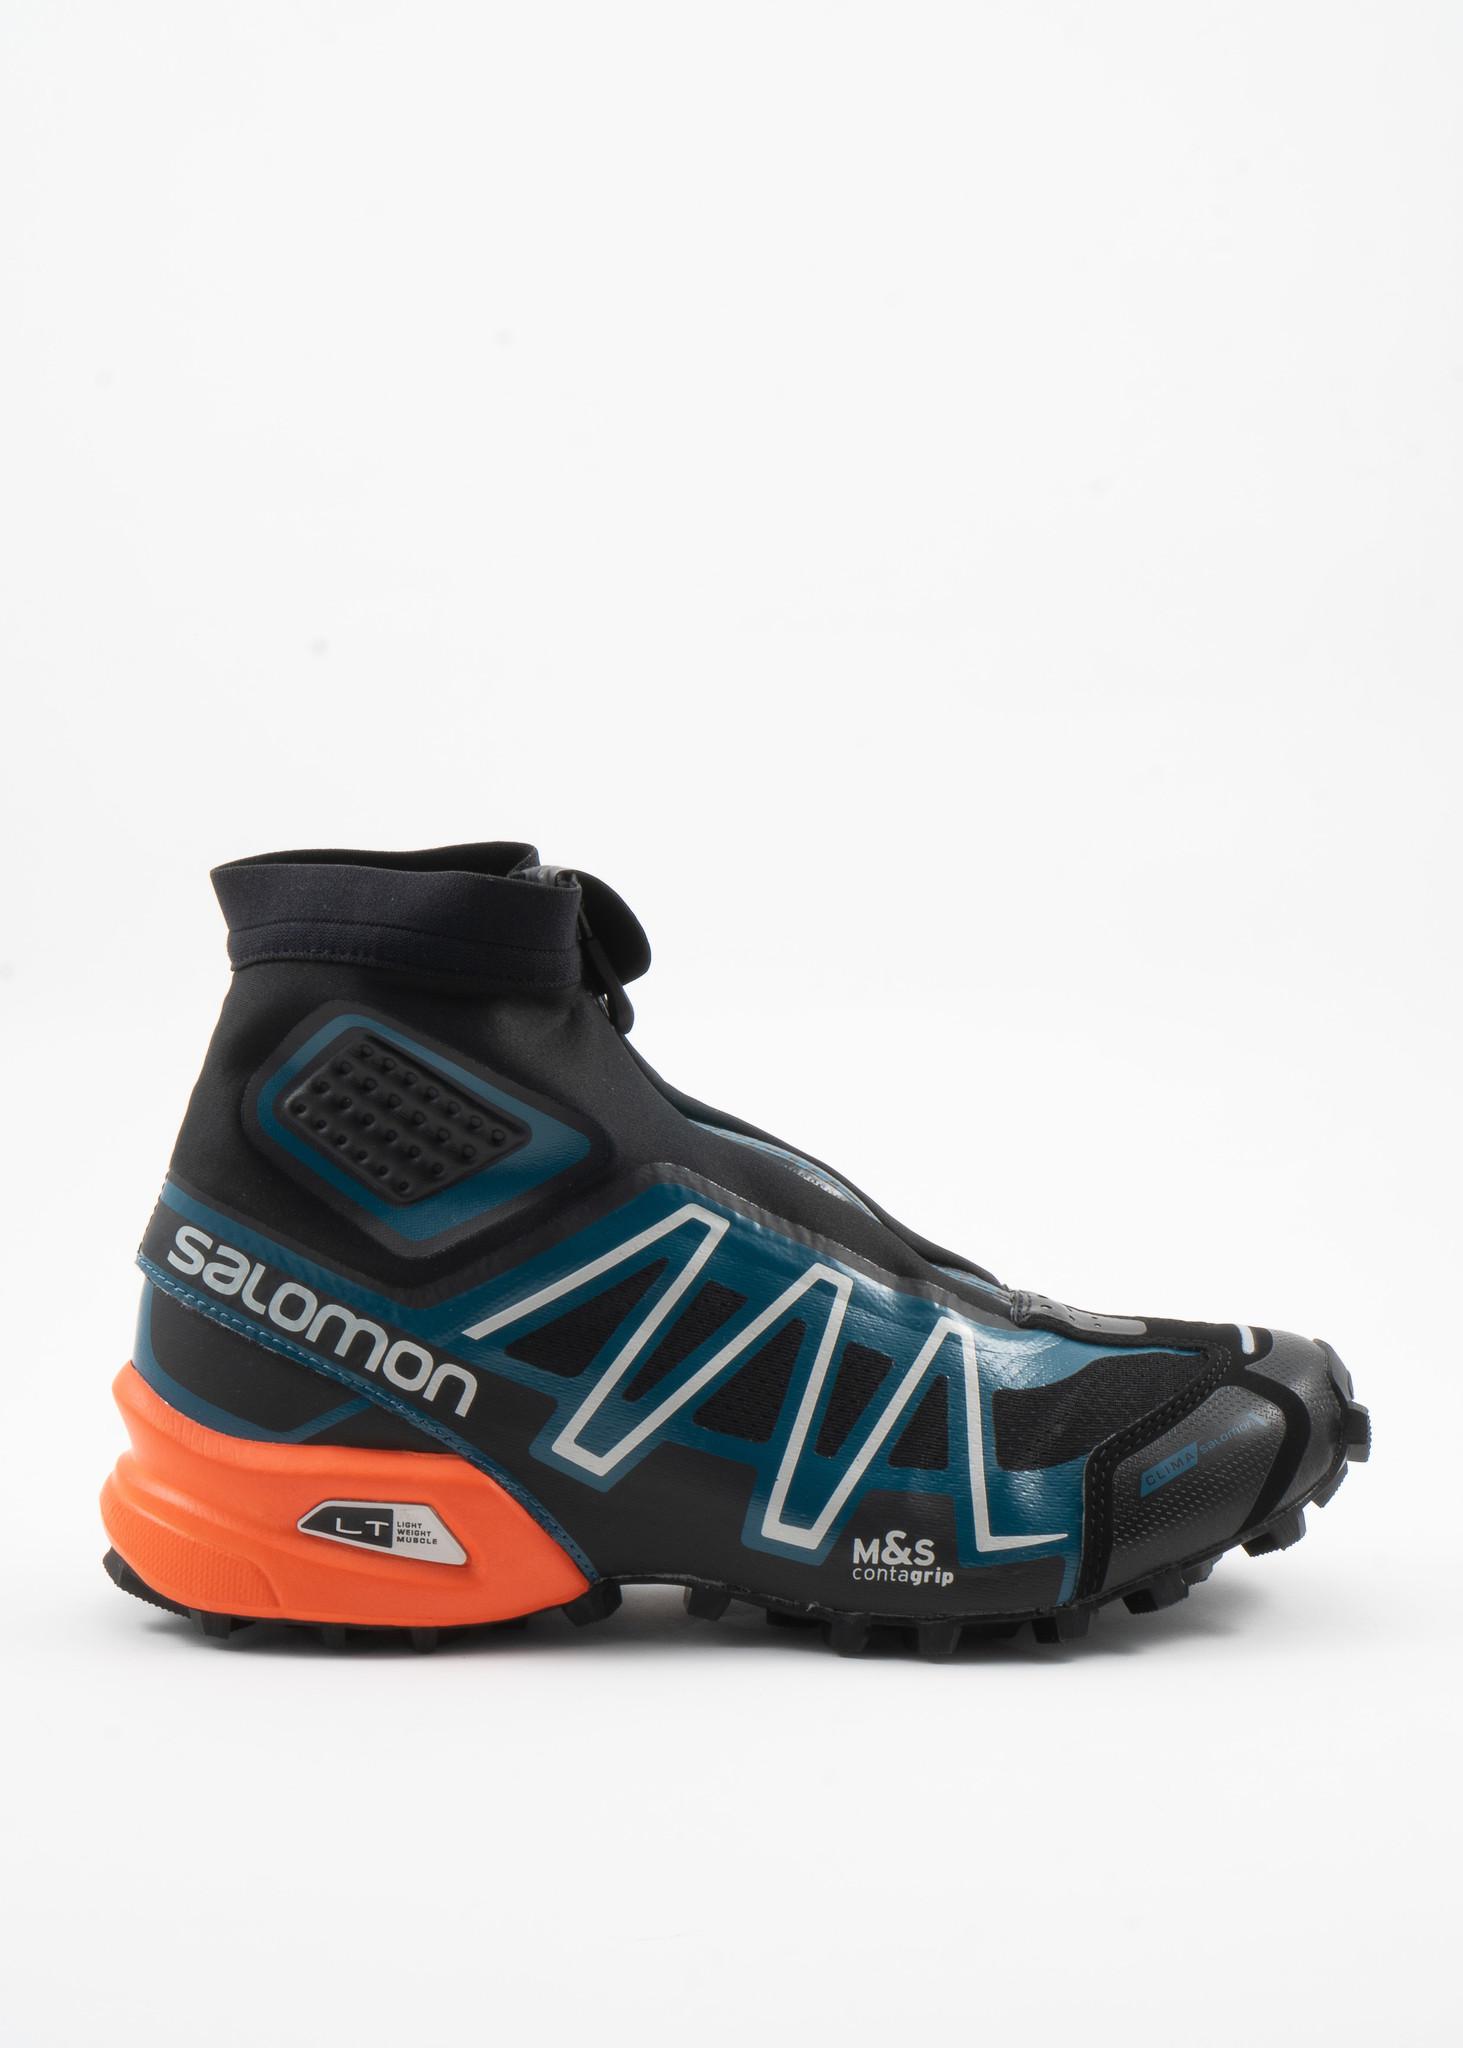 Blue Snowcross Advanced Boots